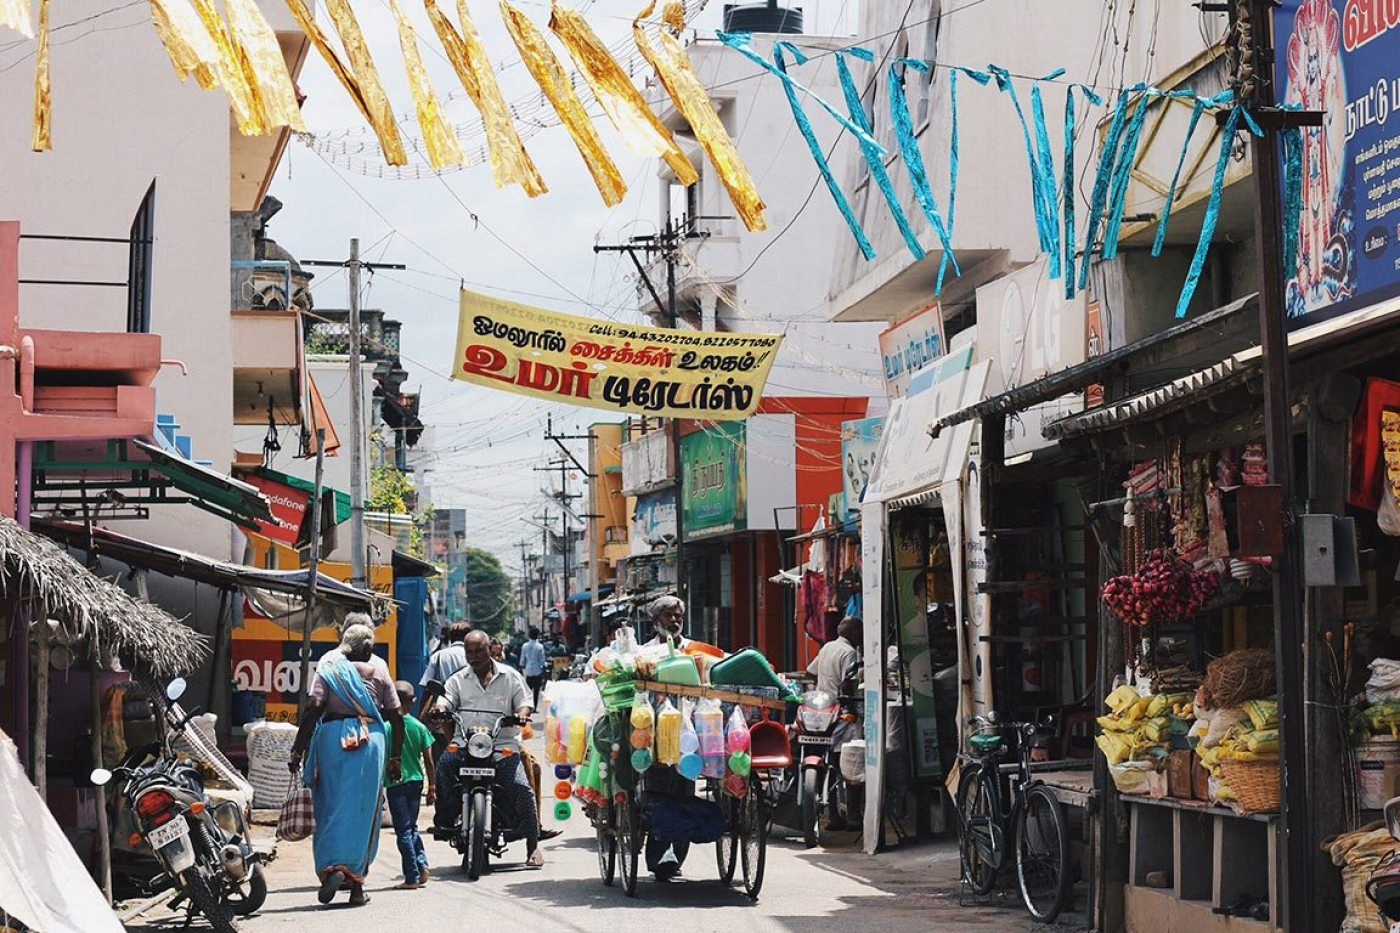 Travel to India shopping